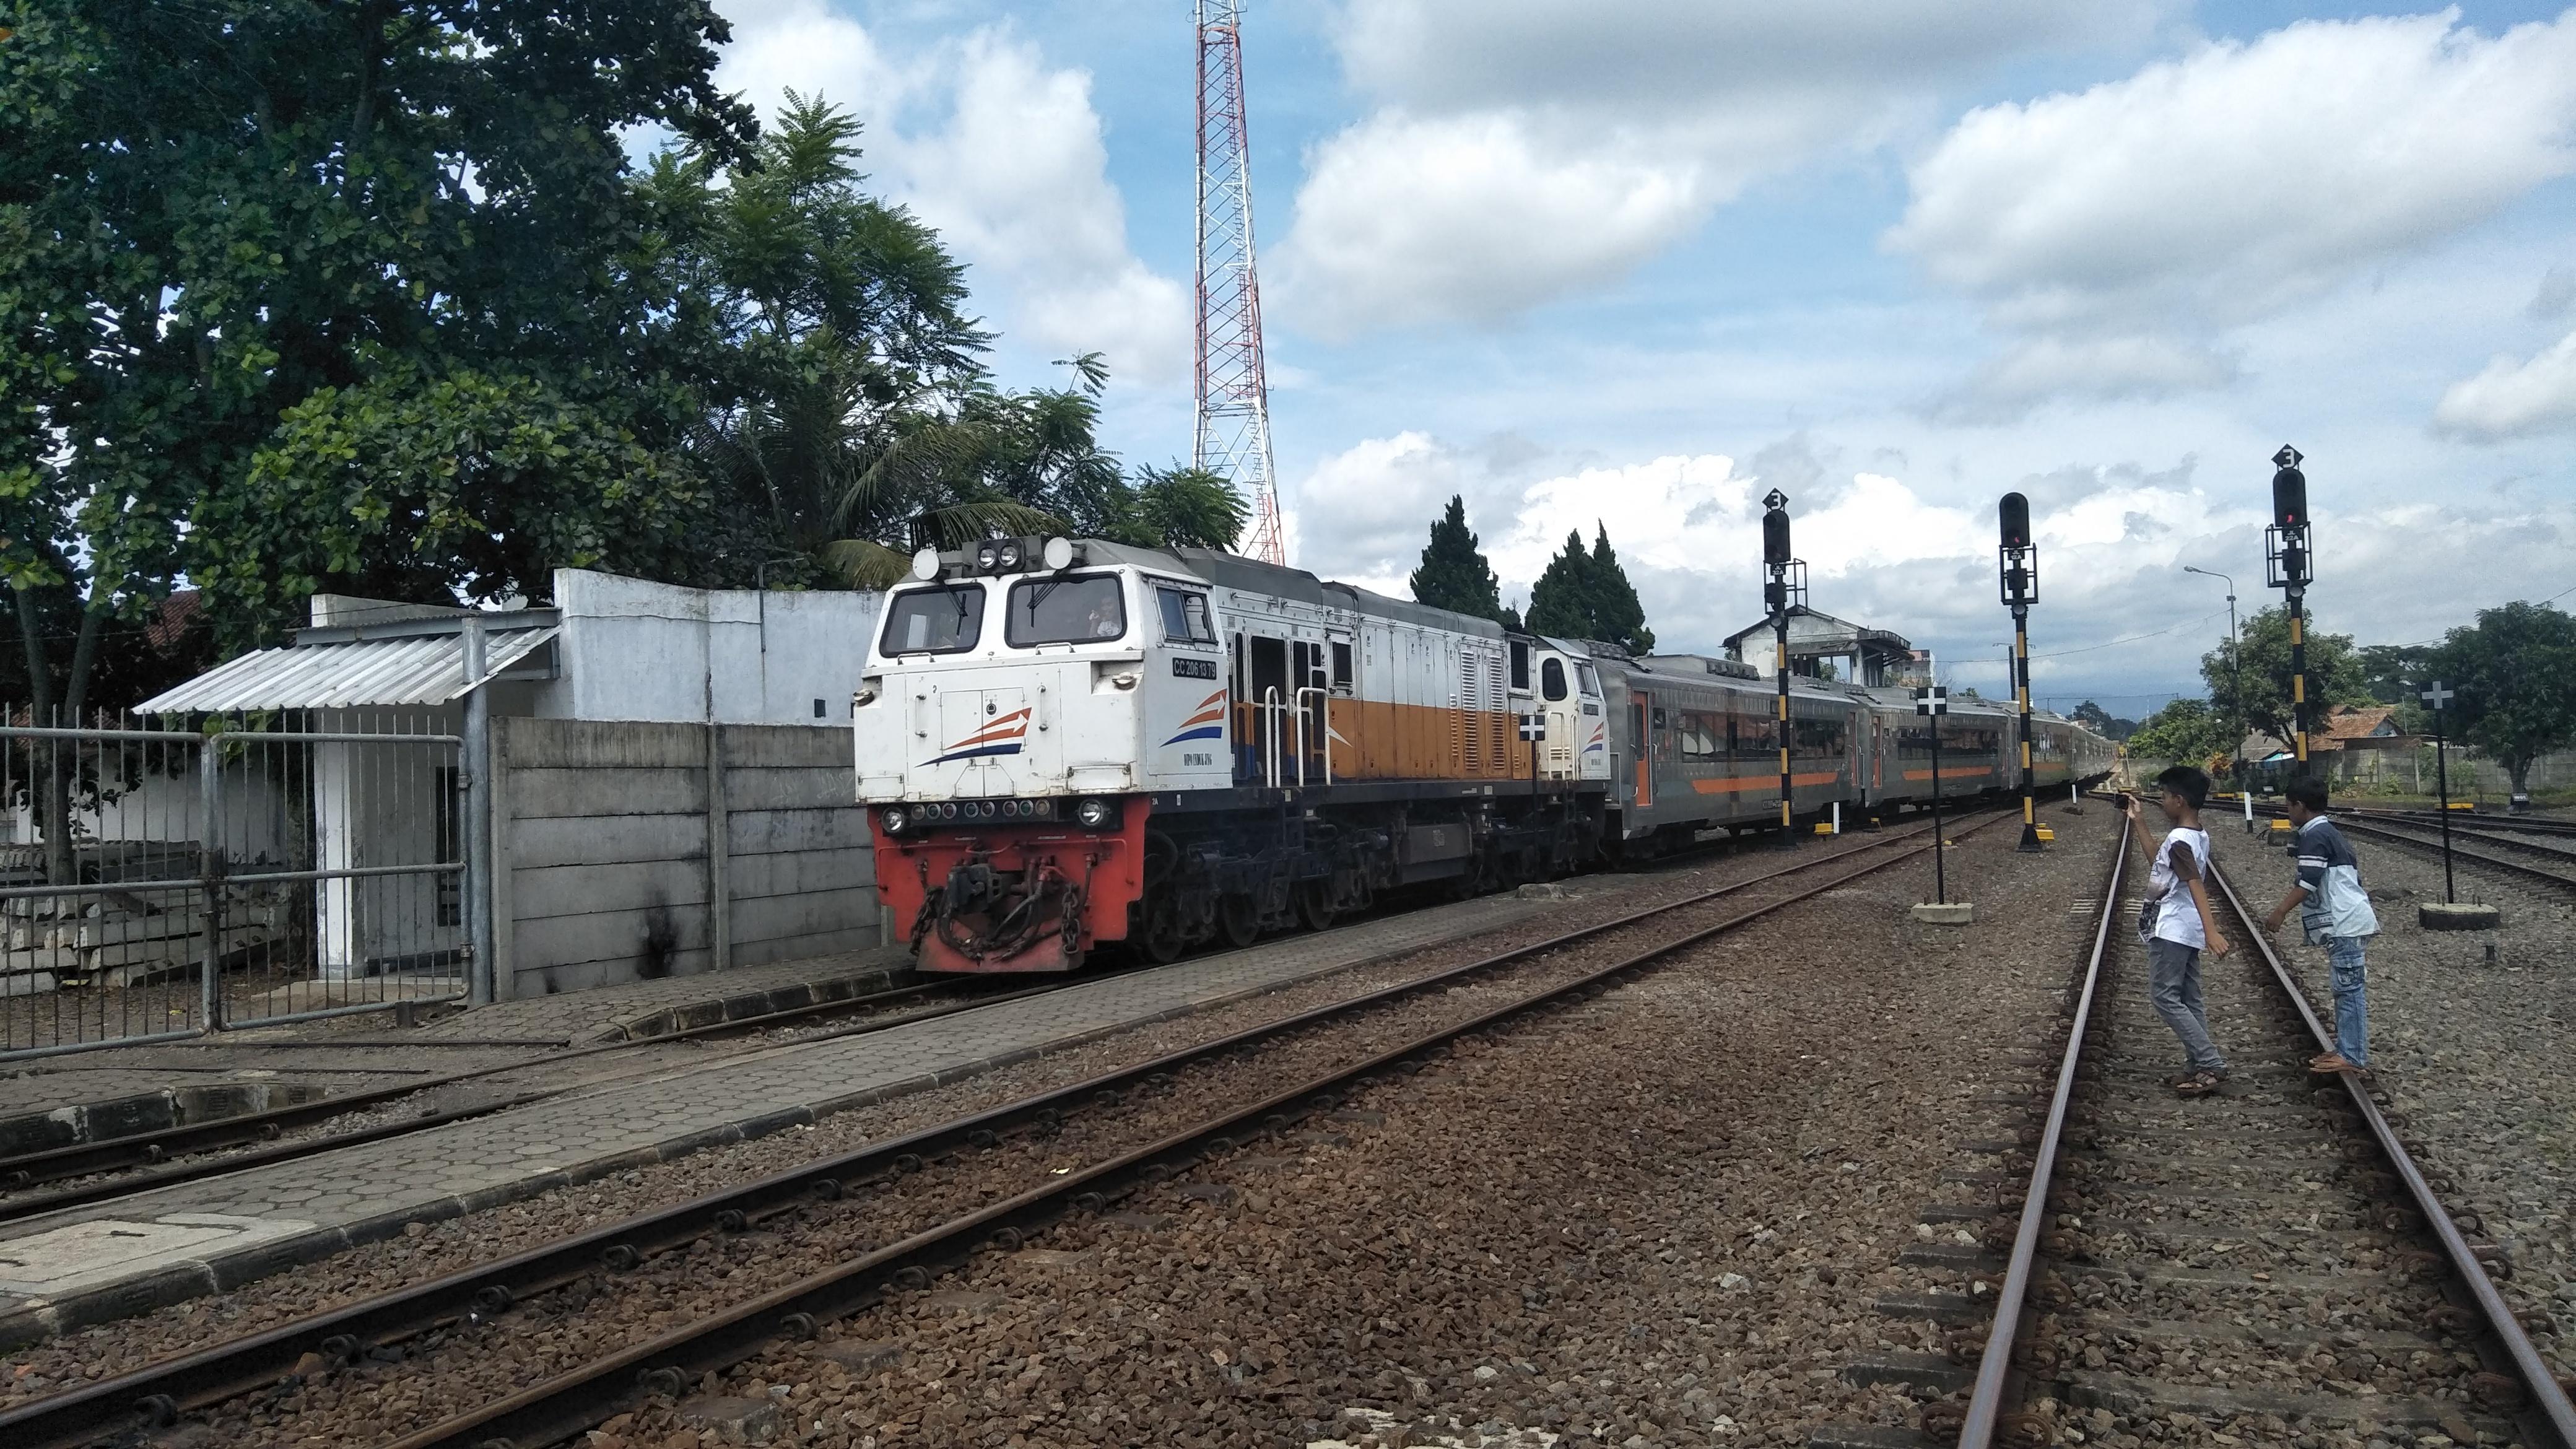 Kereta Api Lodaya Wikipedia Bahasa Indonesia Ensiklopedia Bebas